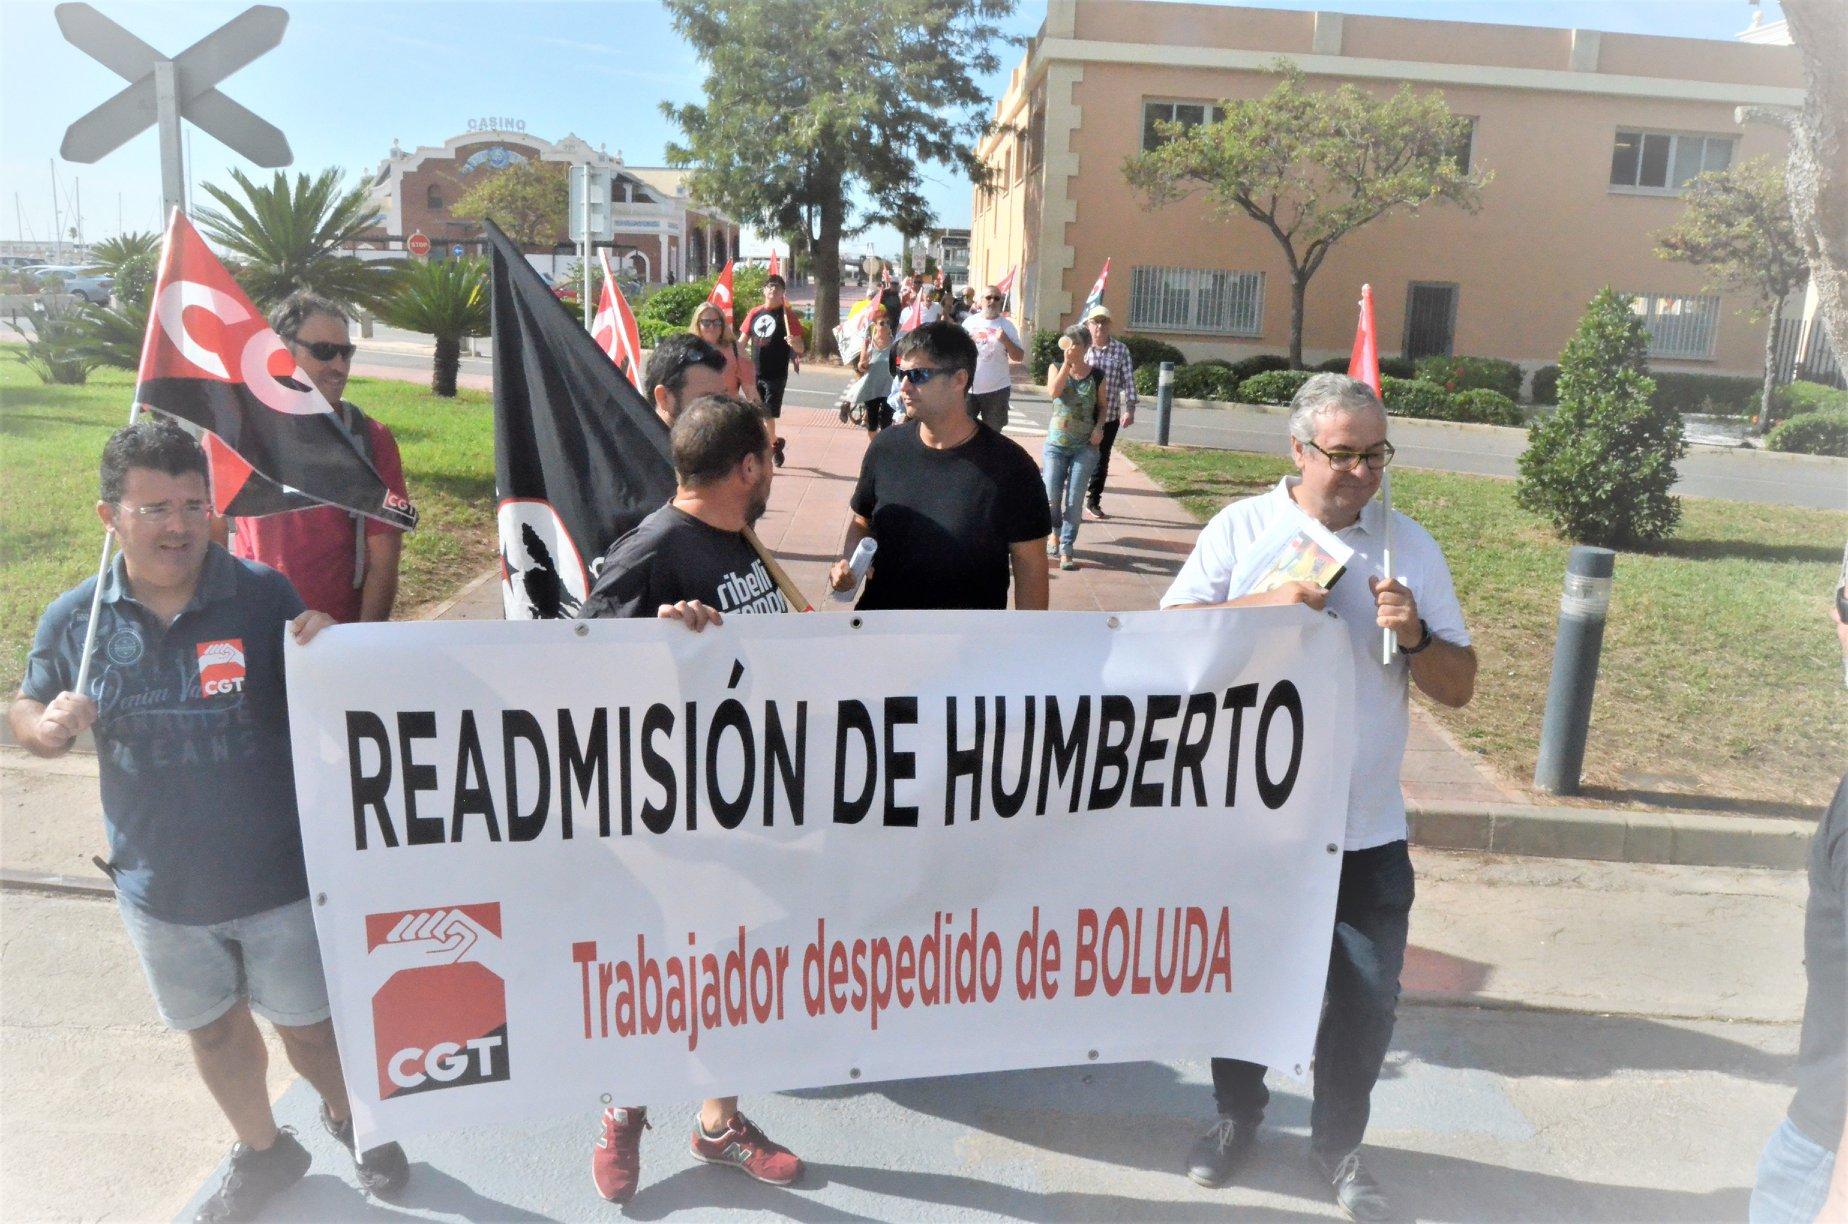 Humberto Readmisión 2